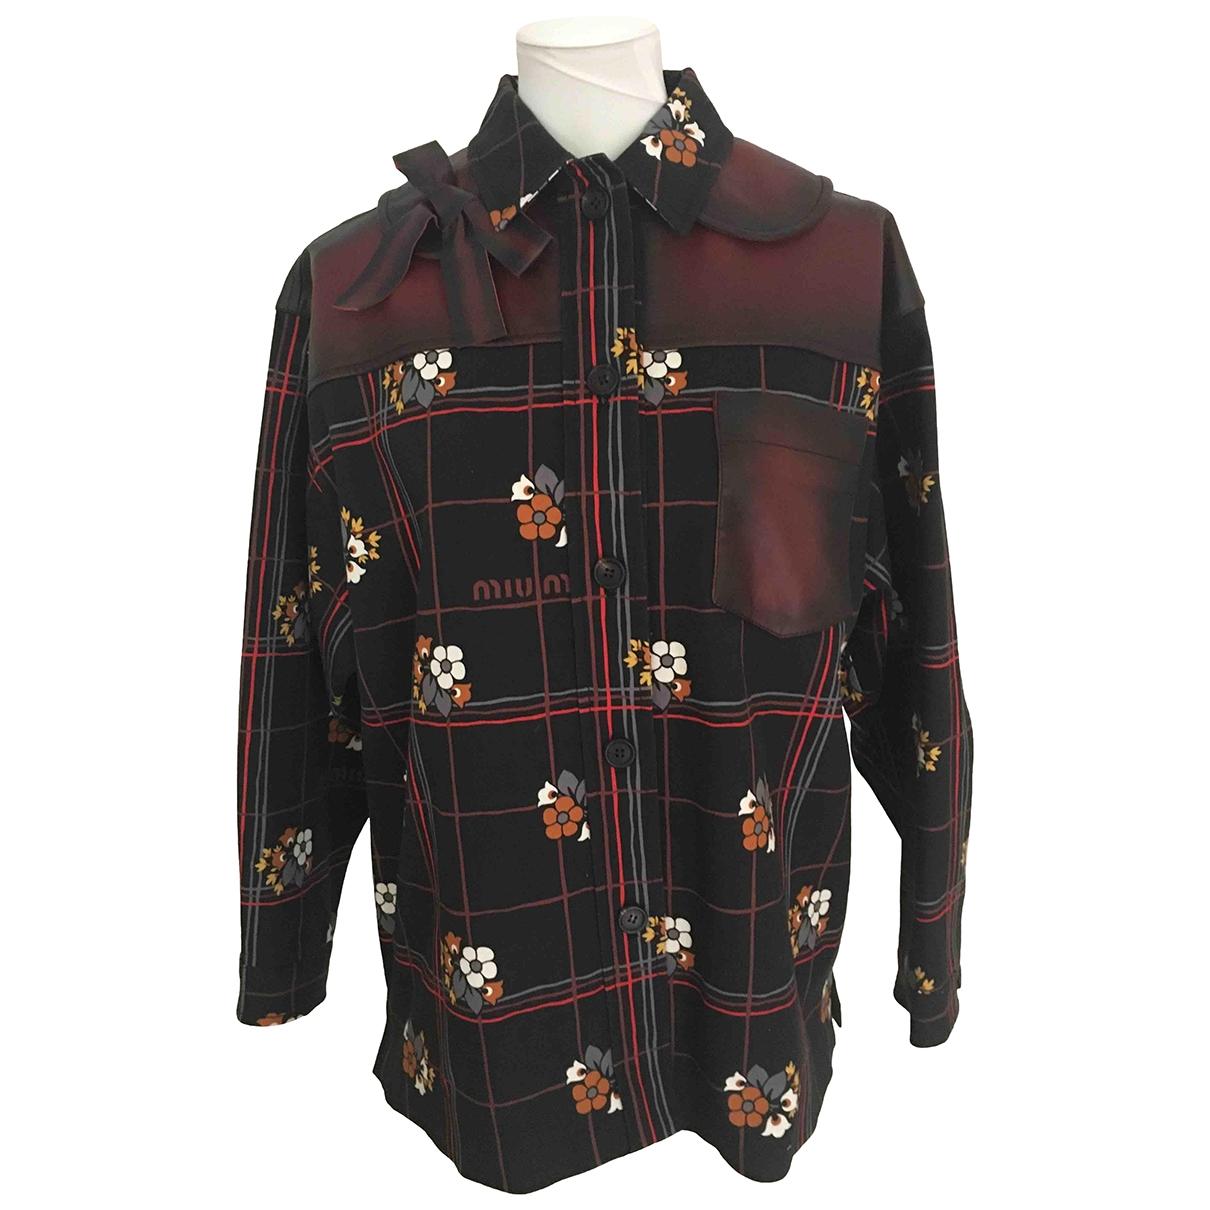 Miu Miu \N Multicolour Cotton jacket for Women 38 IT